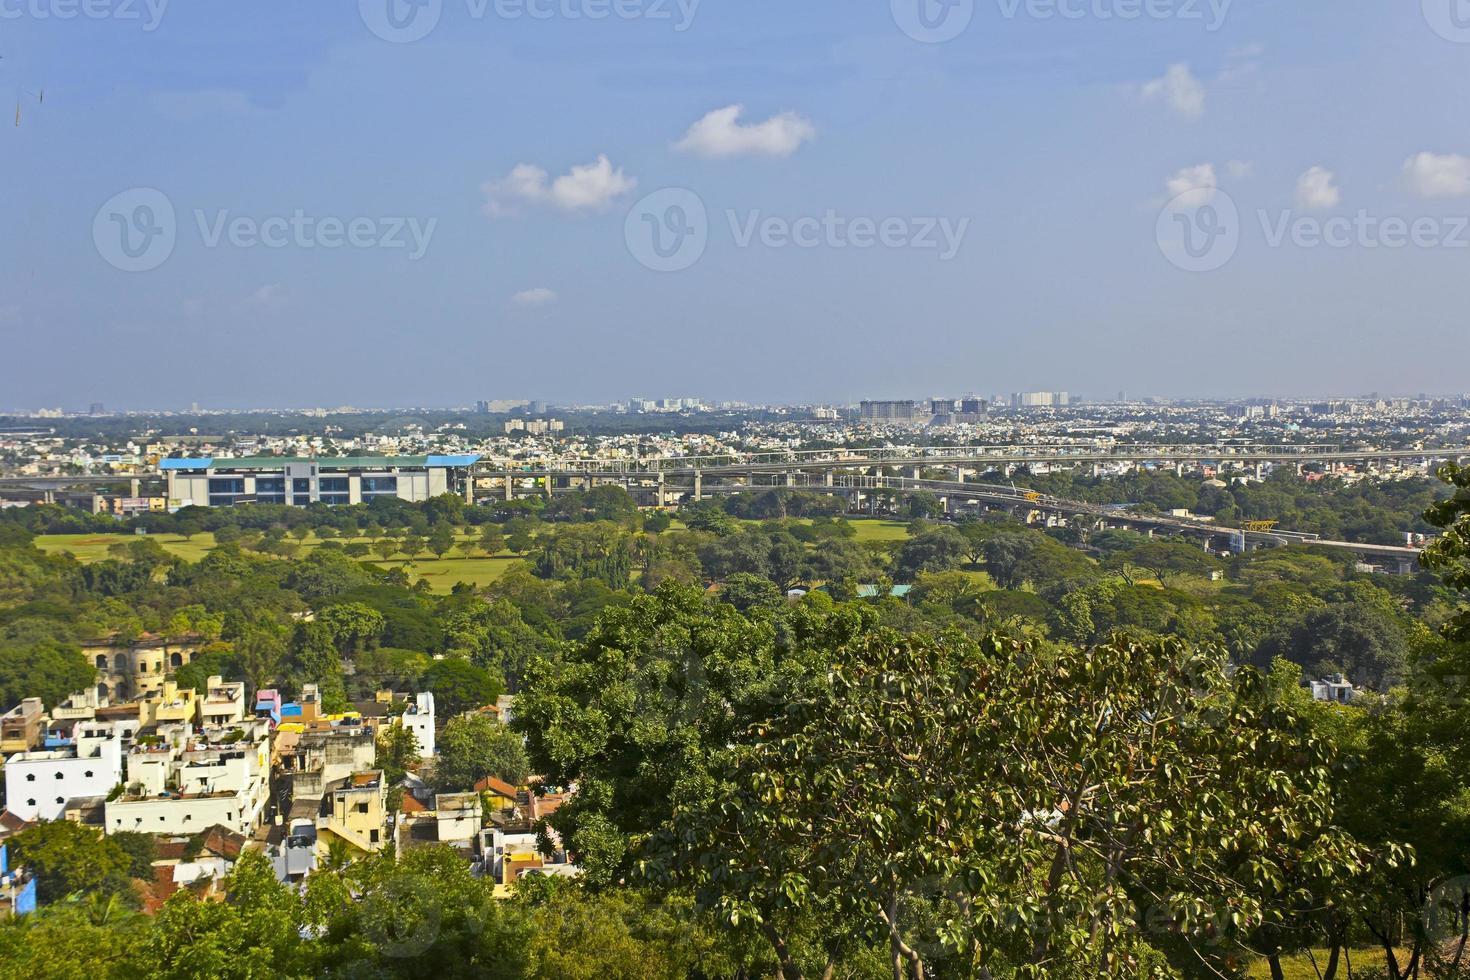 Chennai photo